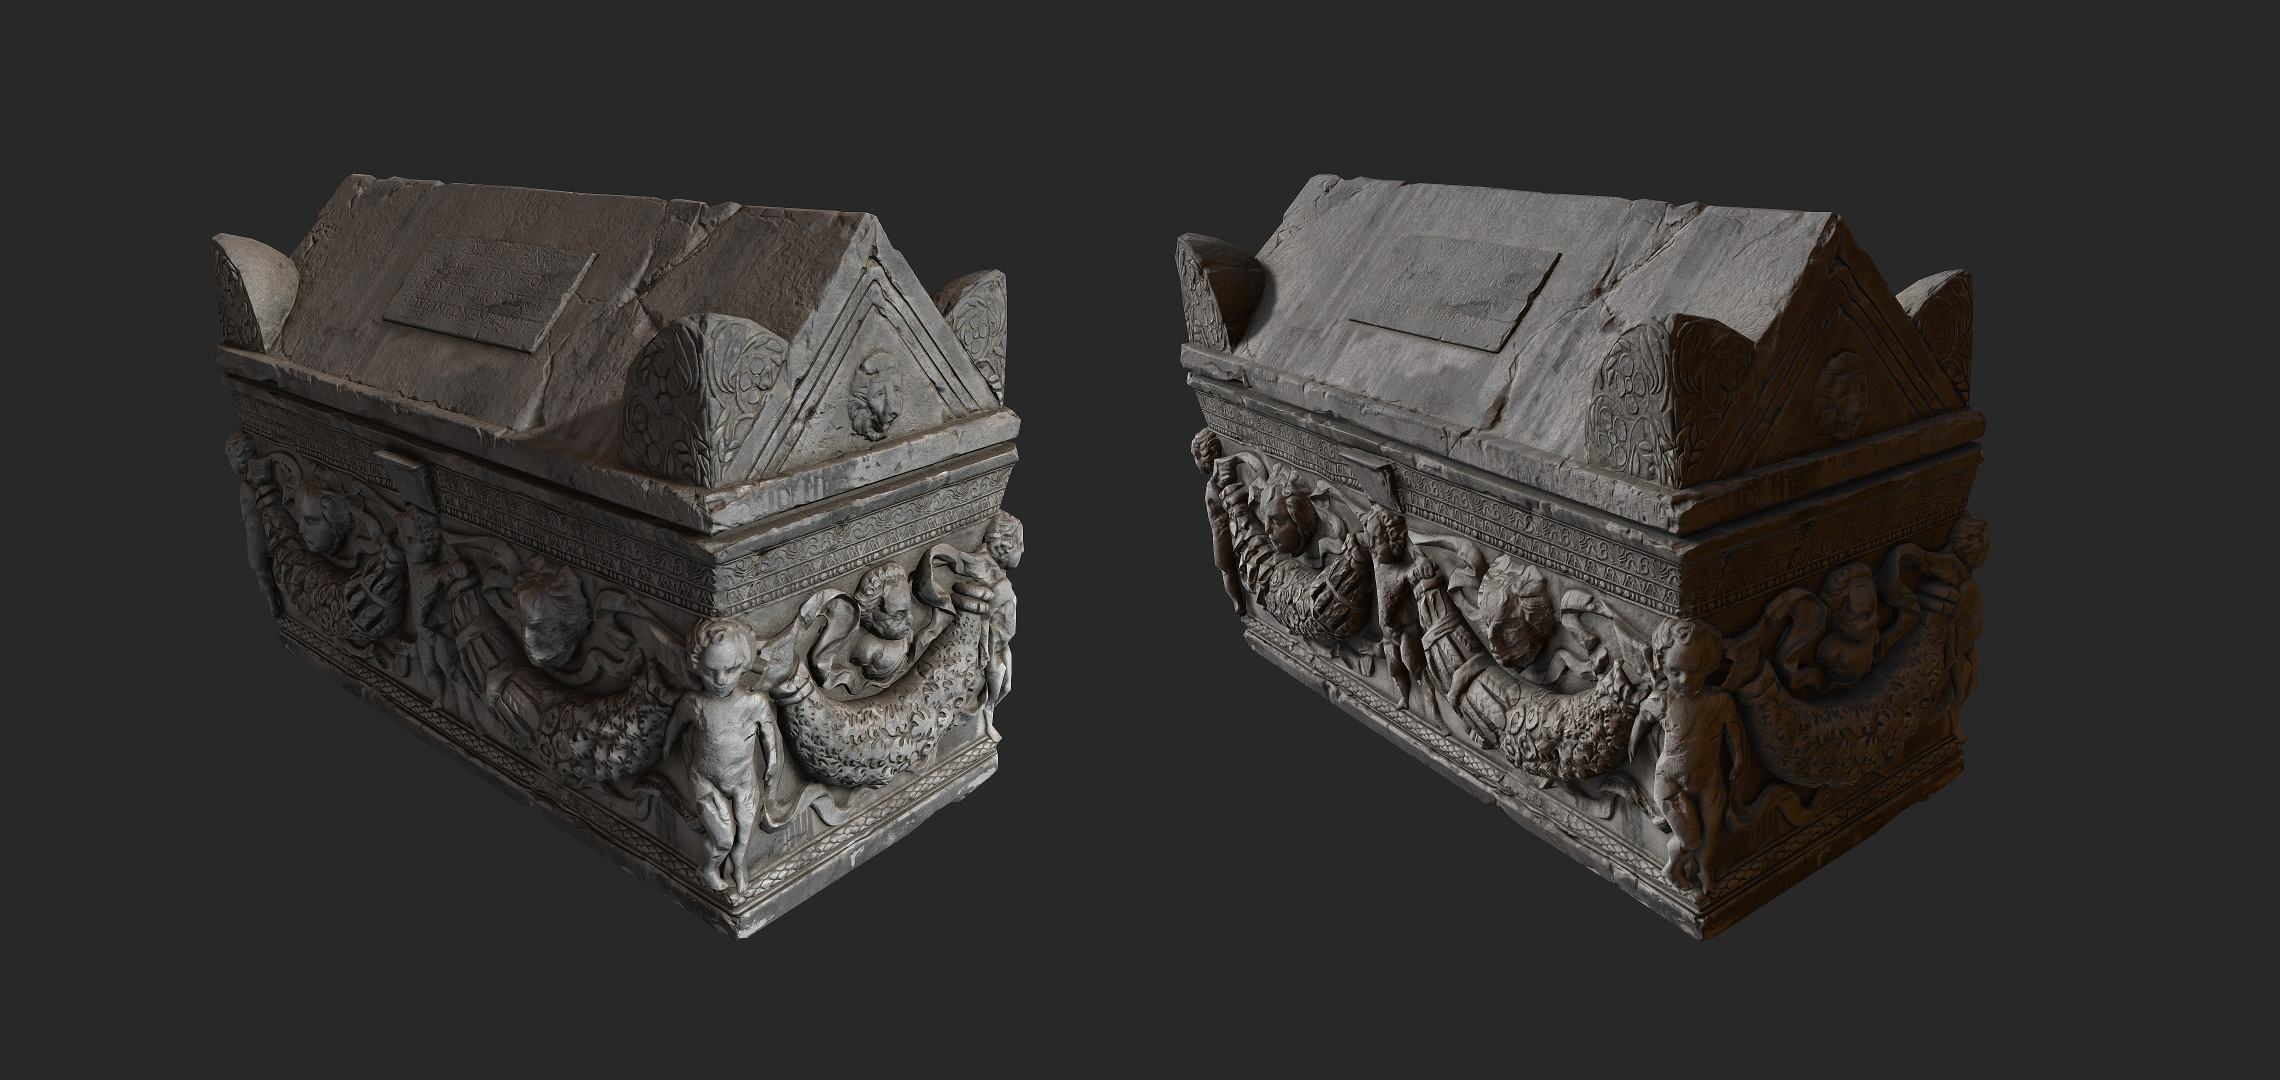 sarcophagus_01.jpg